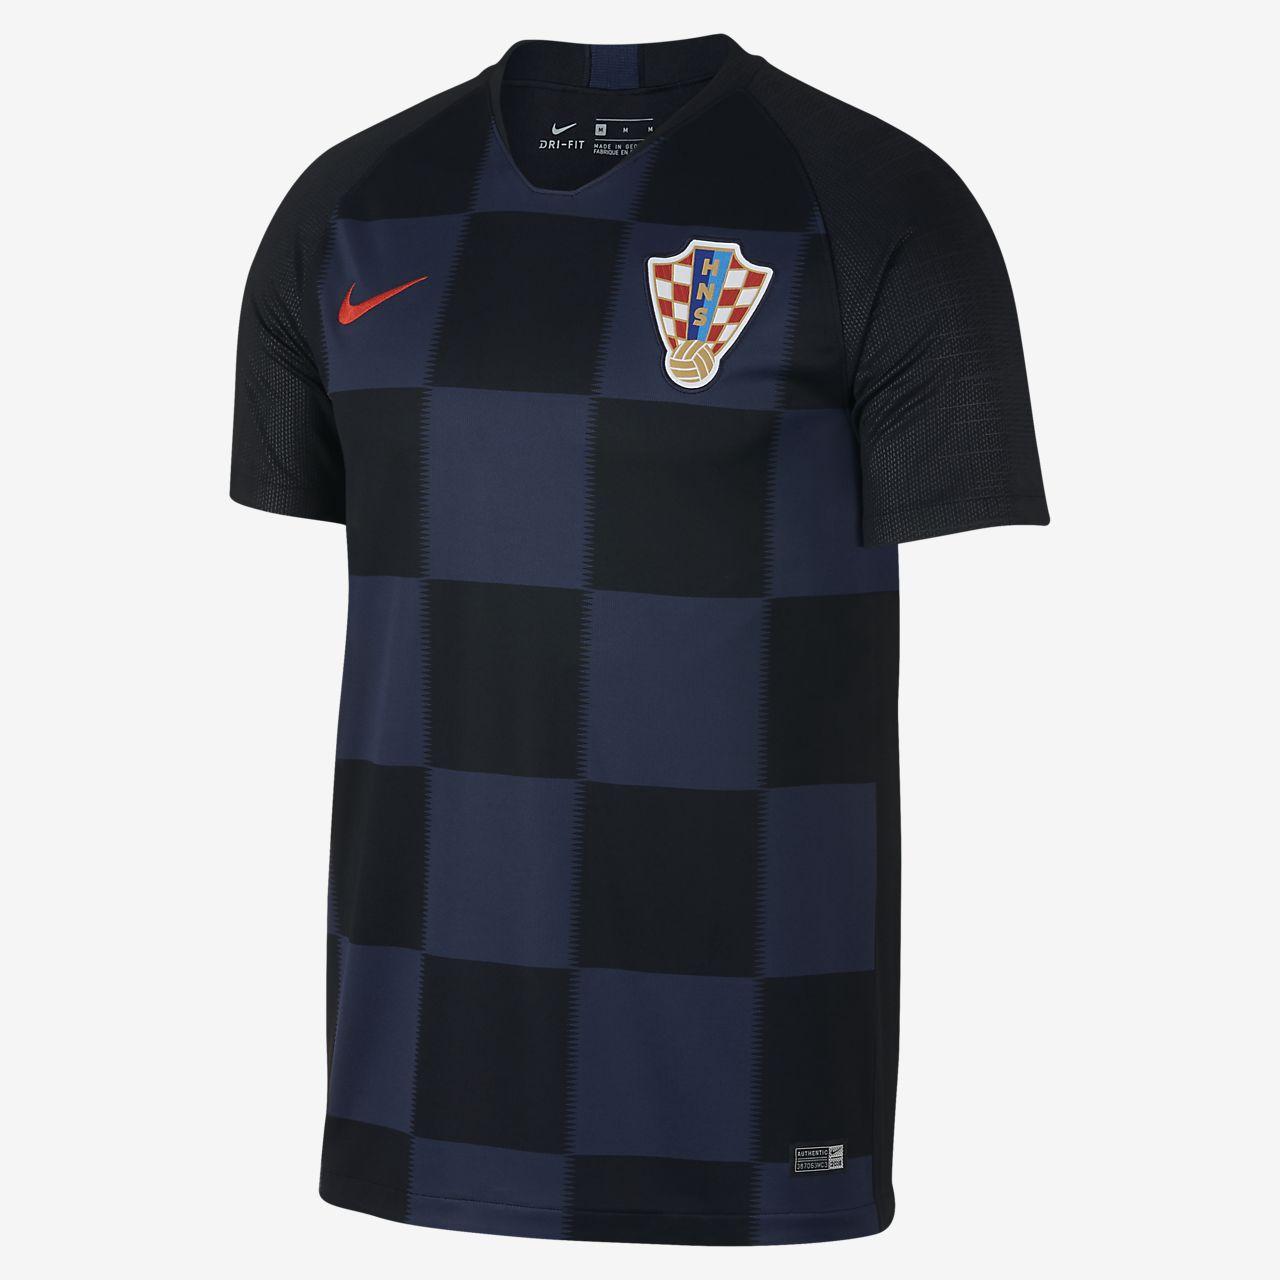 2018 Croatia Stadium Away Men's Football Shirt